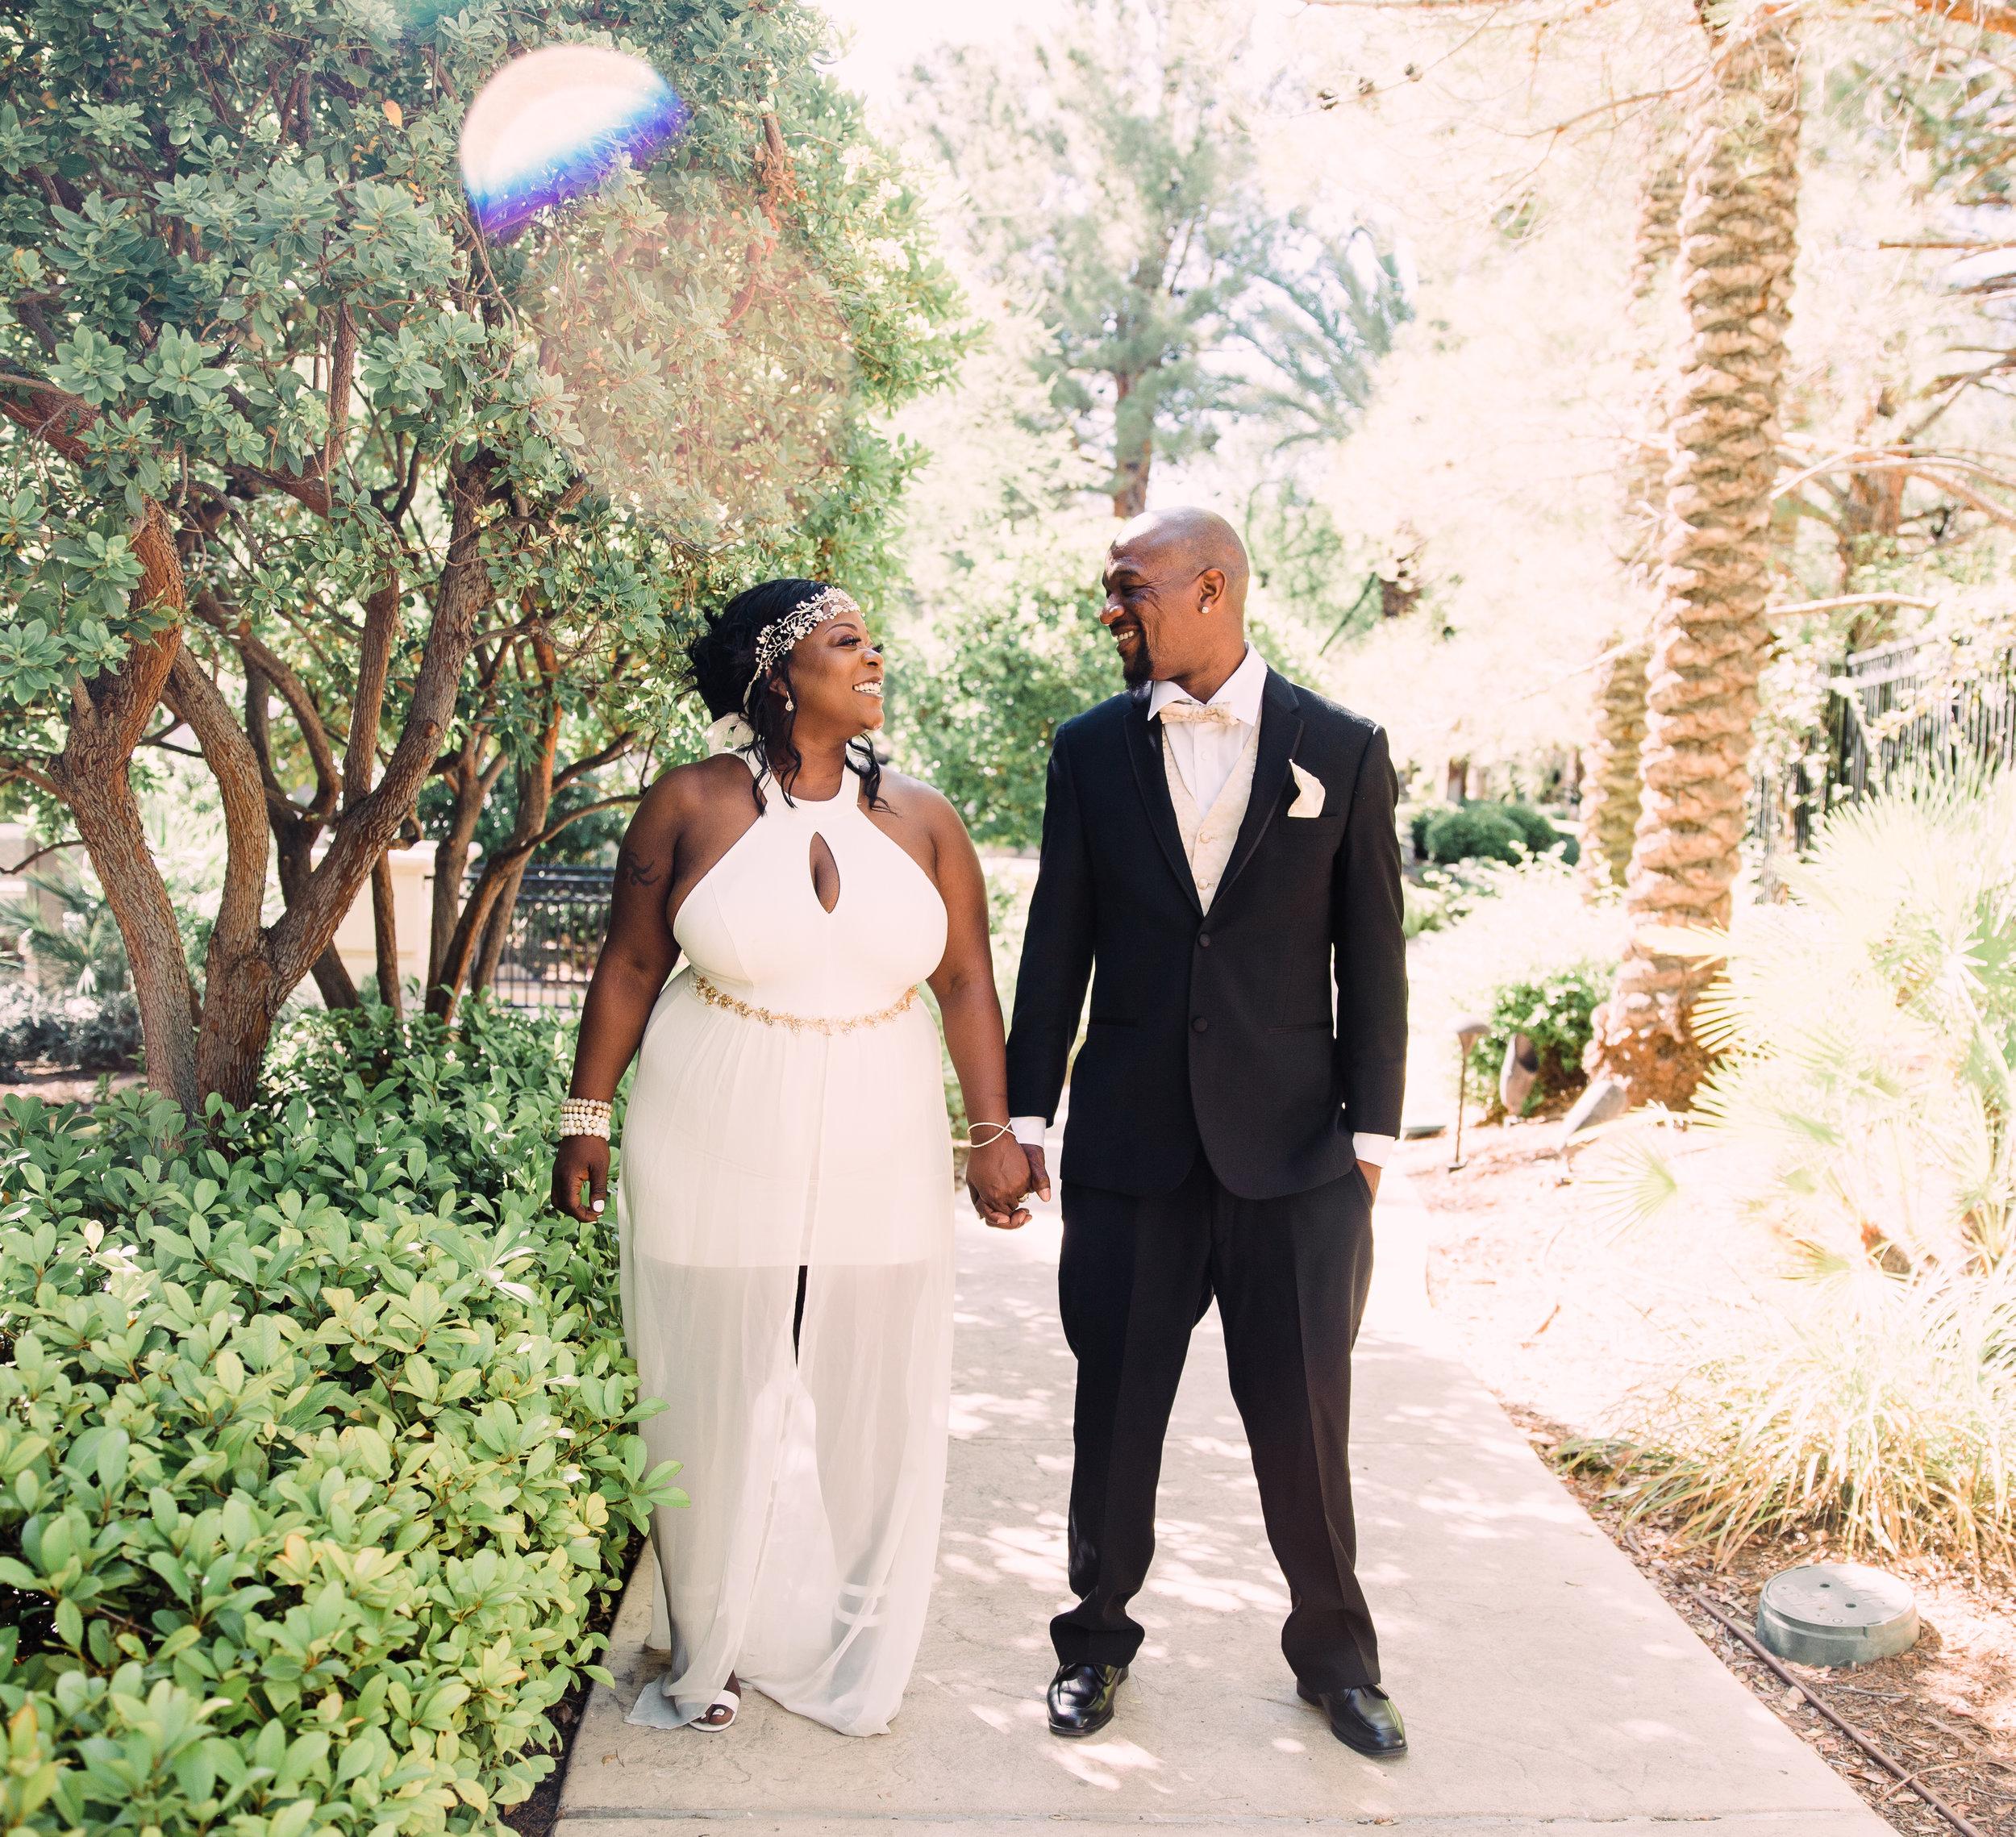 JW Marriott Las Vegas Wedding